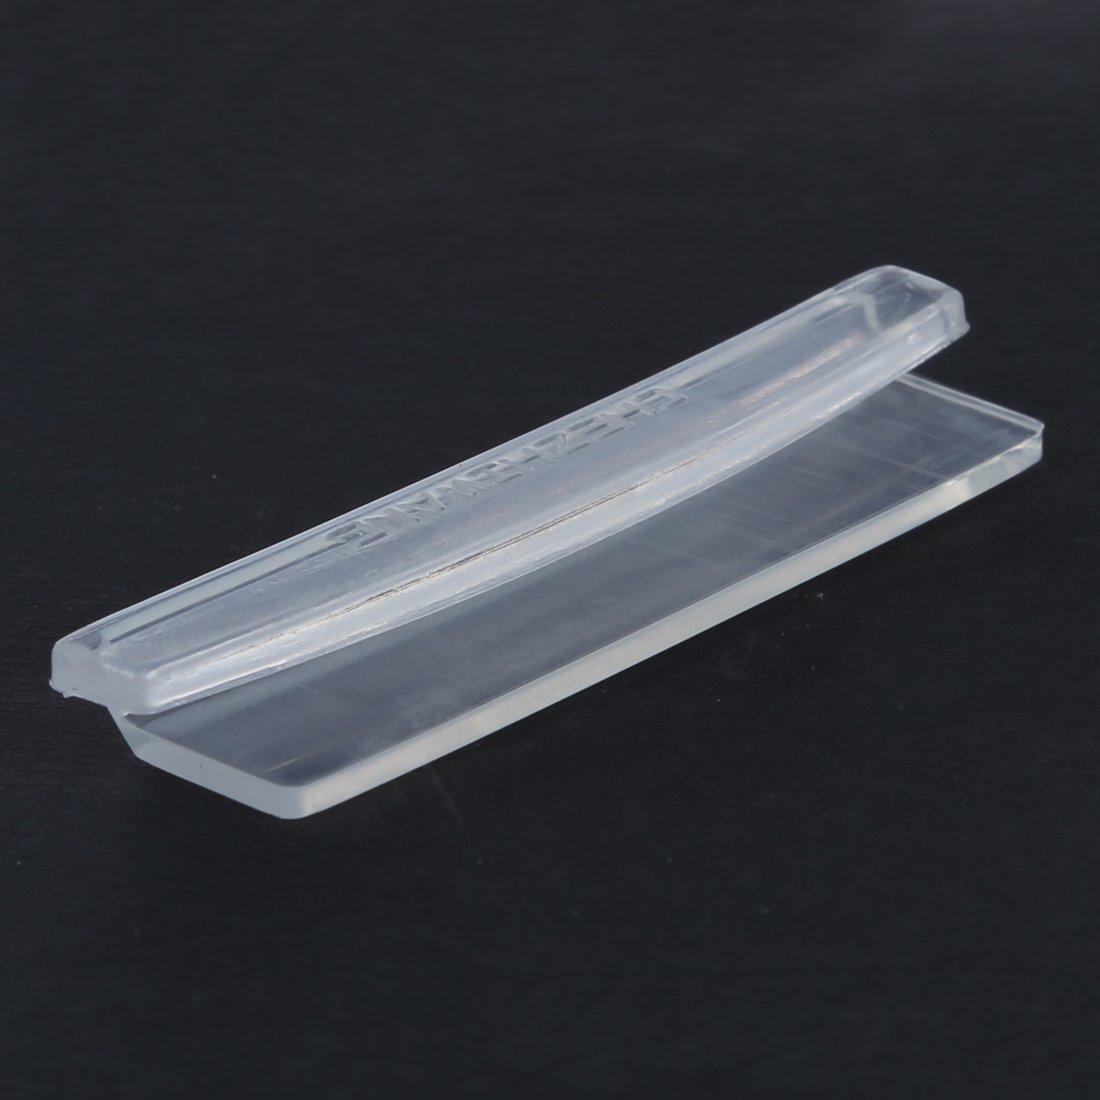 8pcs Car Door Edge Guards Trim Molding Protection Strip Scratch Protector Clear SODIAL R